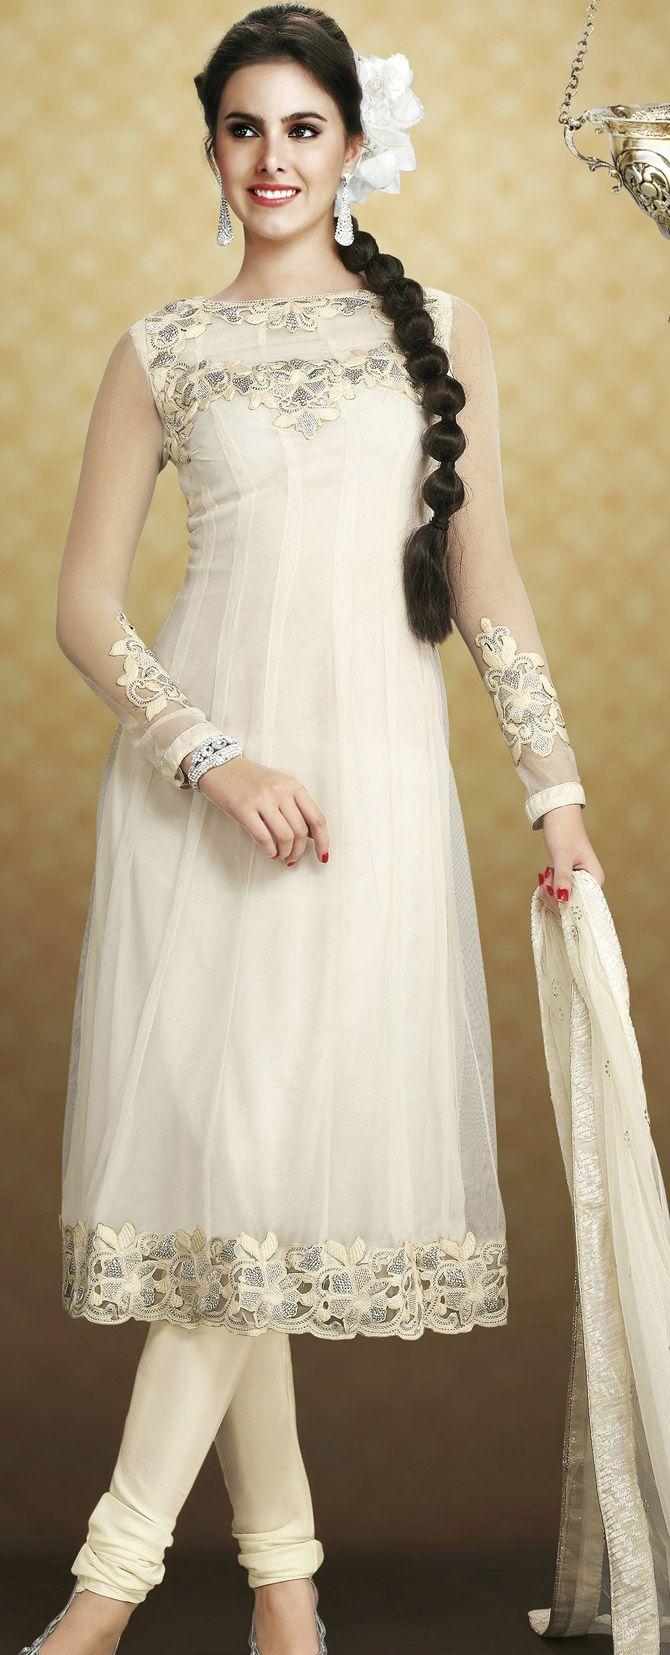 Stylish white dress wedding umbrella frocks churidar designs - Off White Net Churidar Kameez Online Shopping